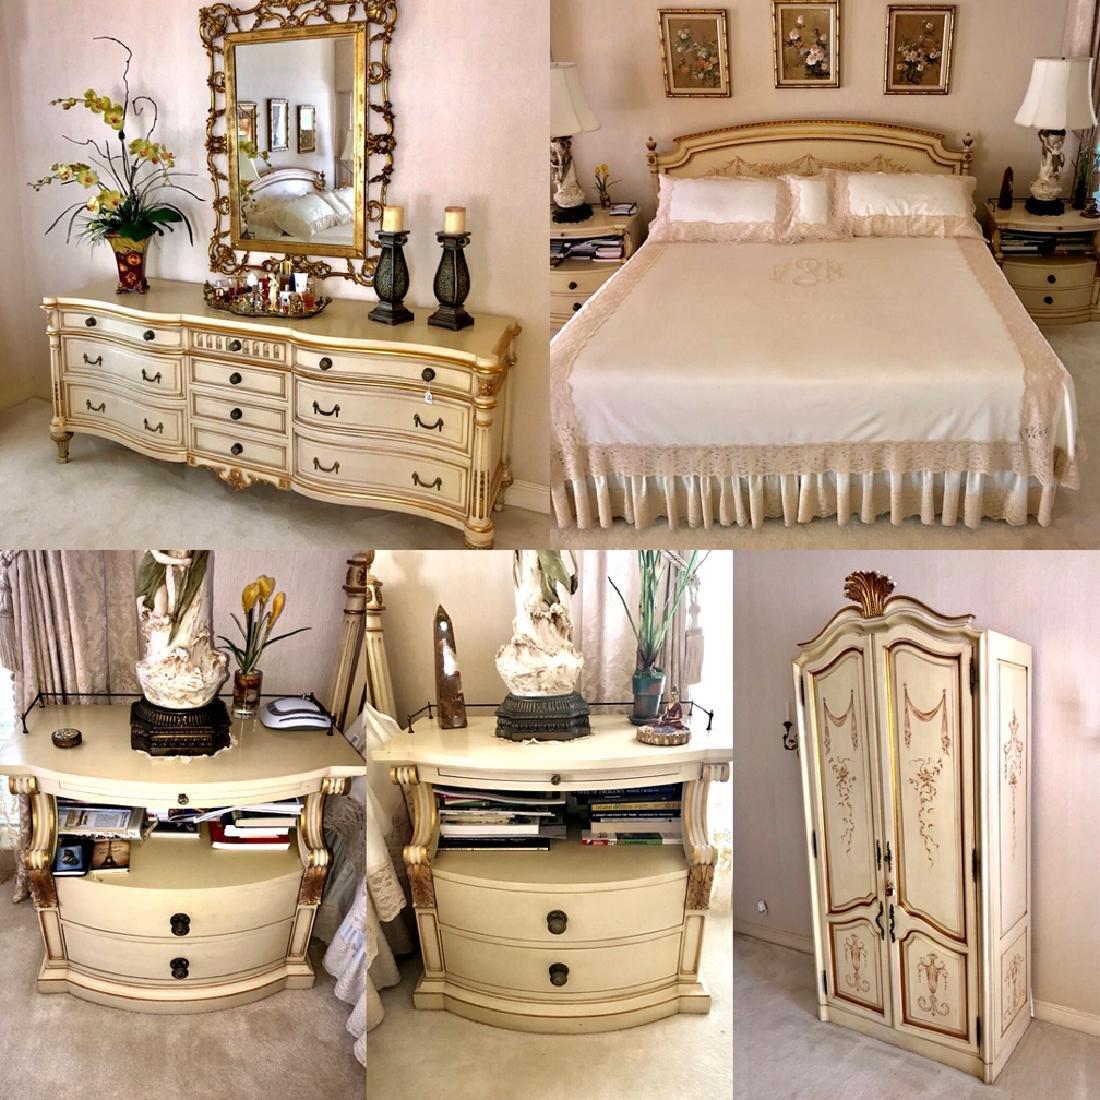 5 Piece Karges Custom Georgian Bedroom Suite. Includes: